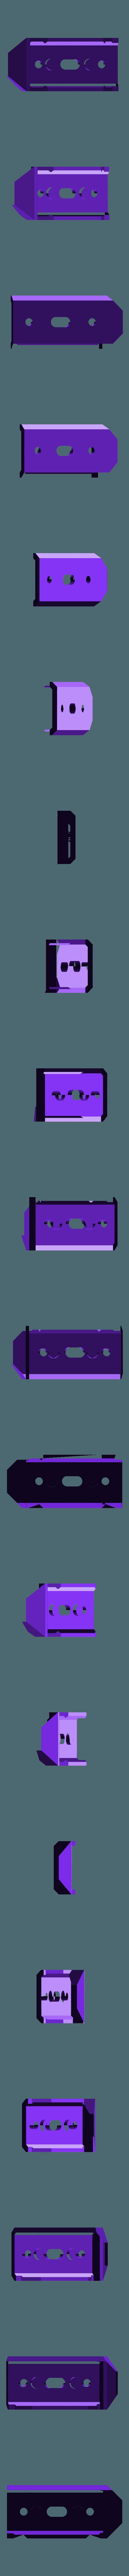 rezz-itsy-box.stl Download free STL file Rezz-Inspired NeoPixel Glasses • 3D printing template, Adafruit